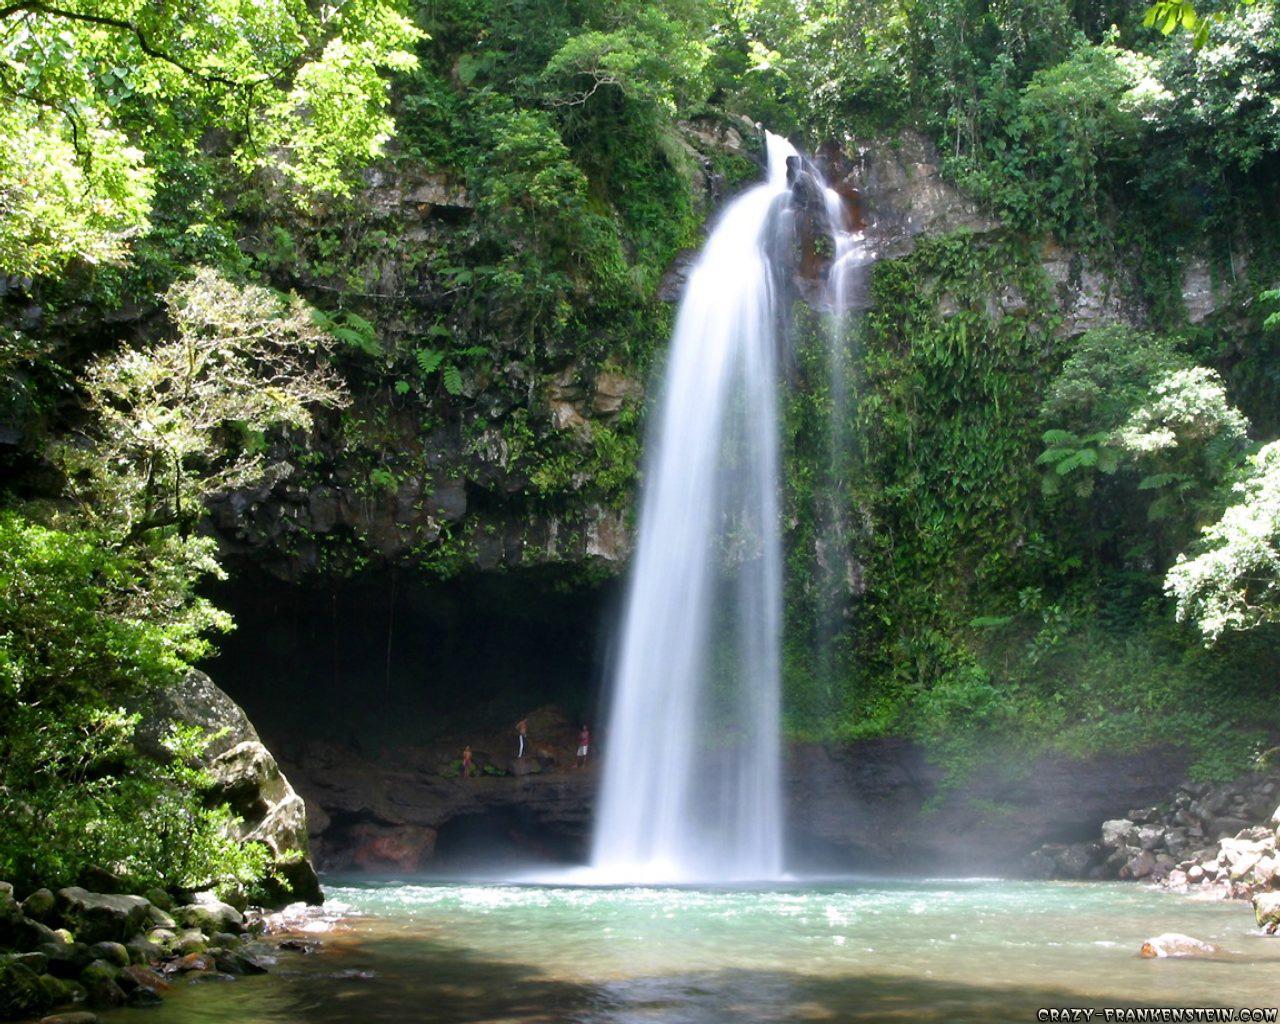 http://3.bp.blogspot.com/-MGrSDJejc3k/UEdJK3GVrfI/AAAAAAAAGL0/0f-SrYk-TUo/s1600/Beauty+Lowe+Rbouma+Waterfall.jpg